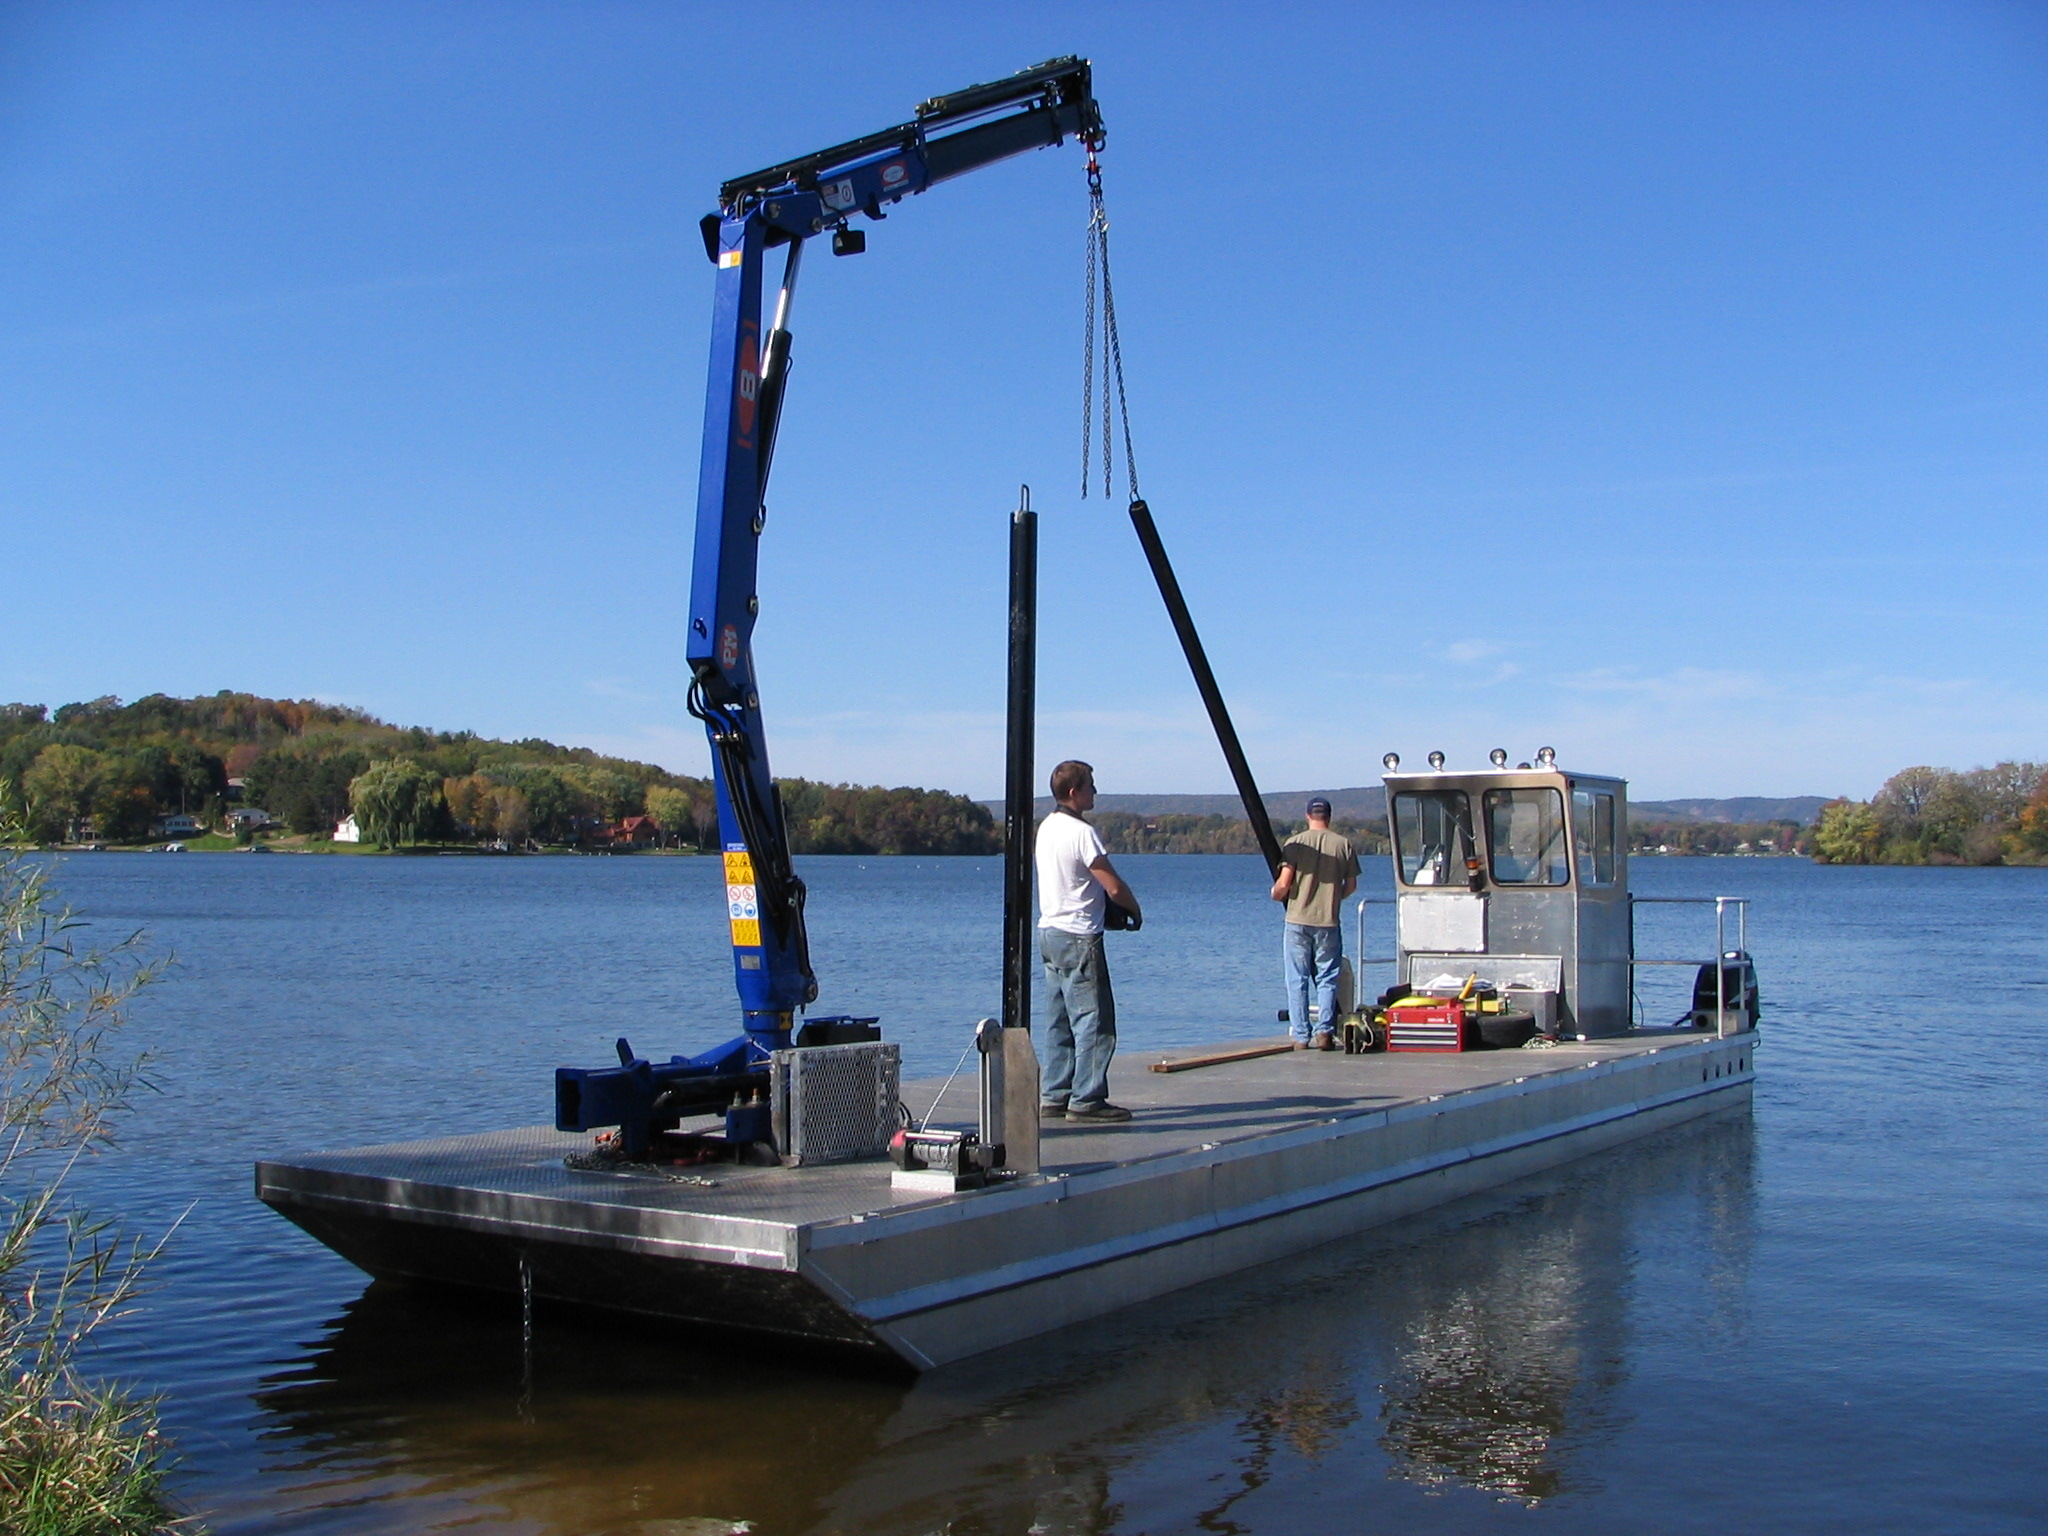 Barge Crane Barge Cranes Oil Cleanup Grapple Crane